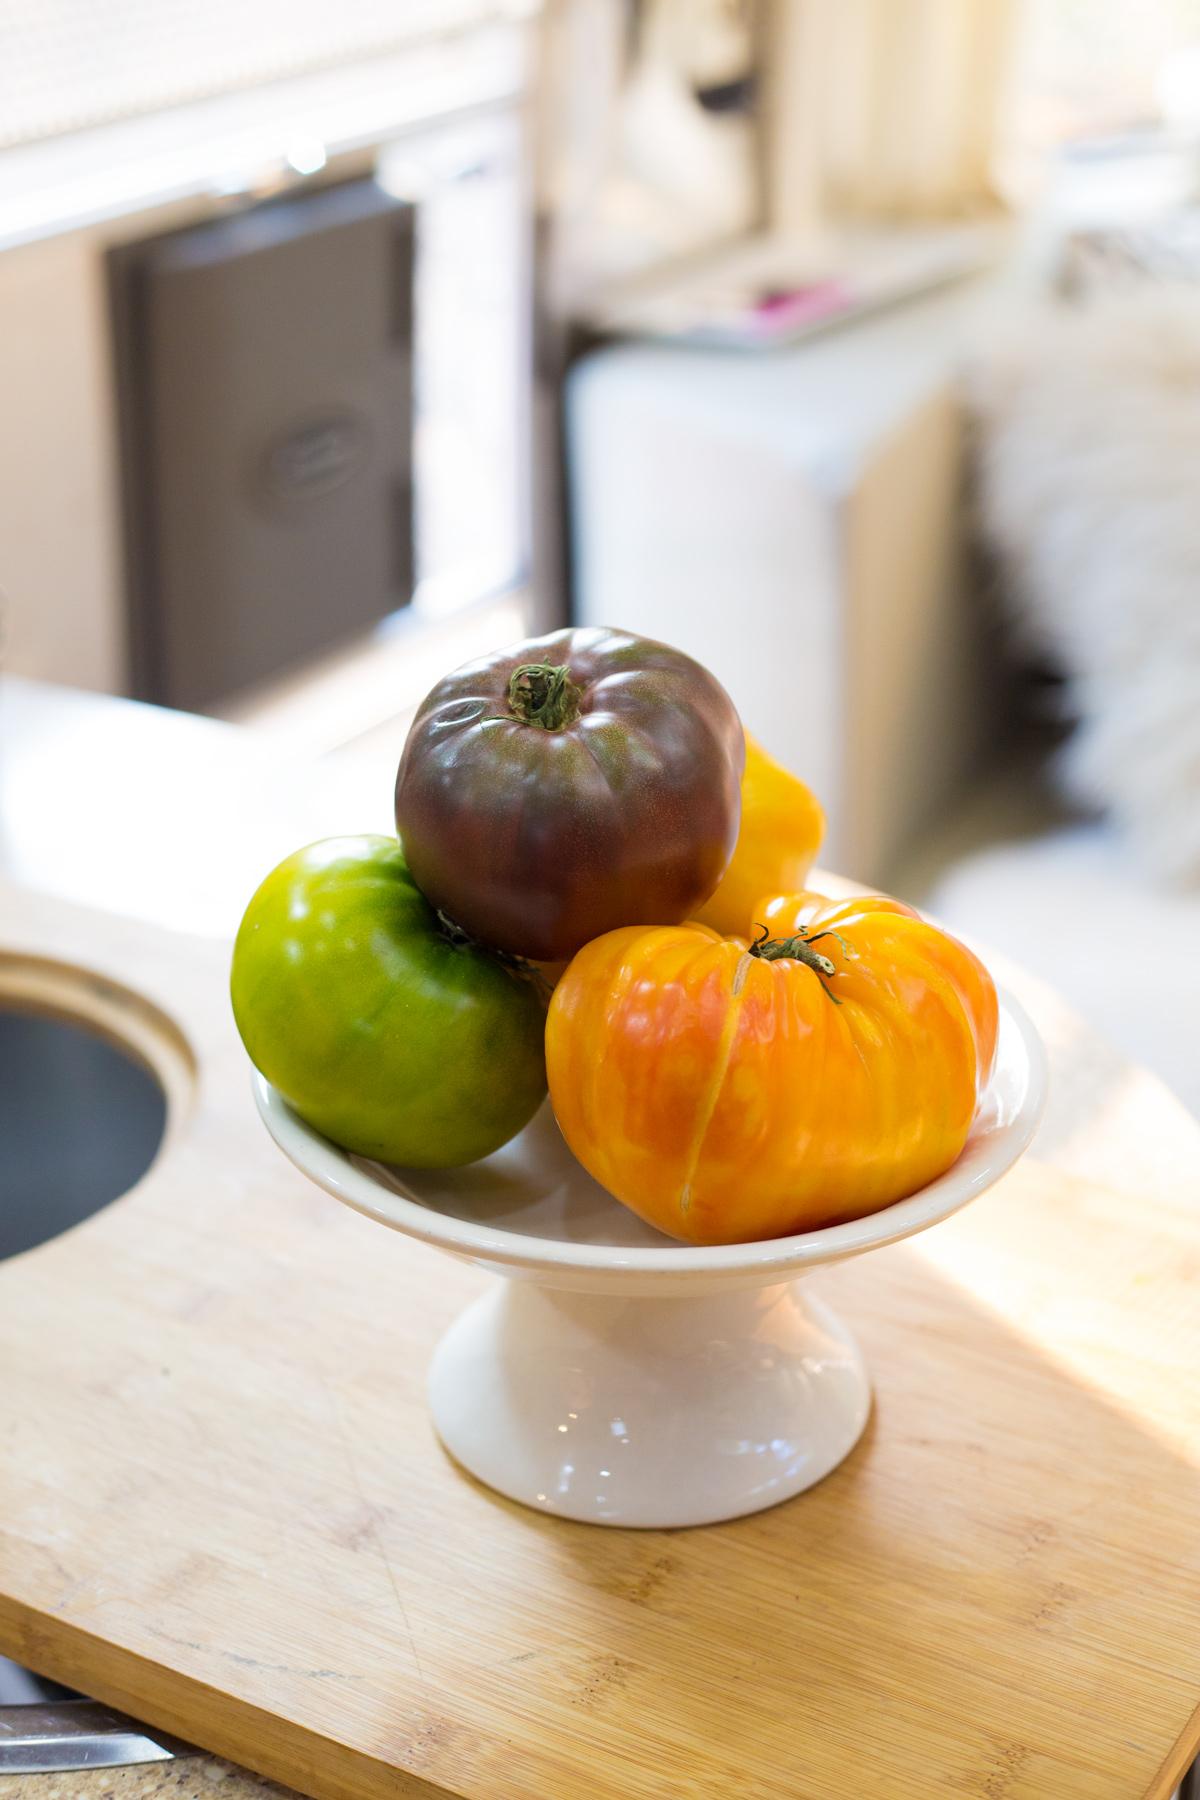 Heirloom Tomatoes via J5MM.com